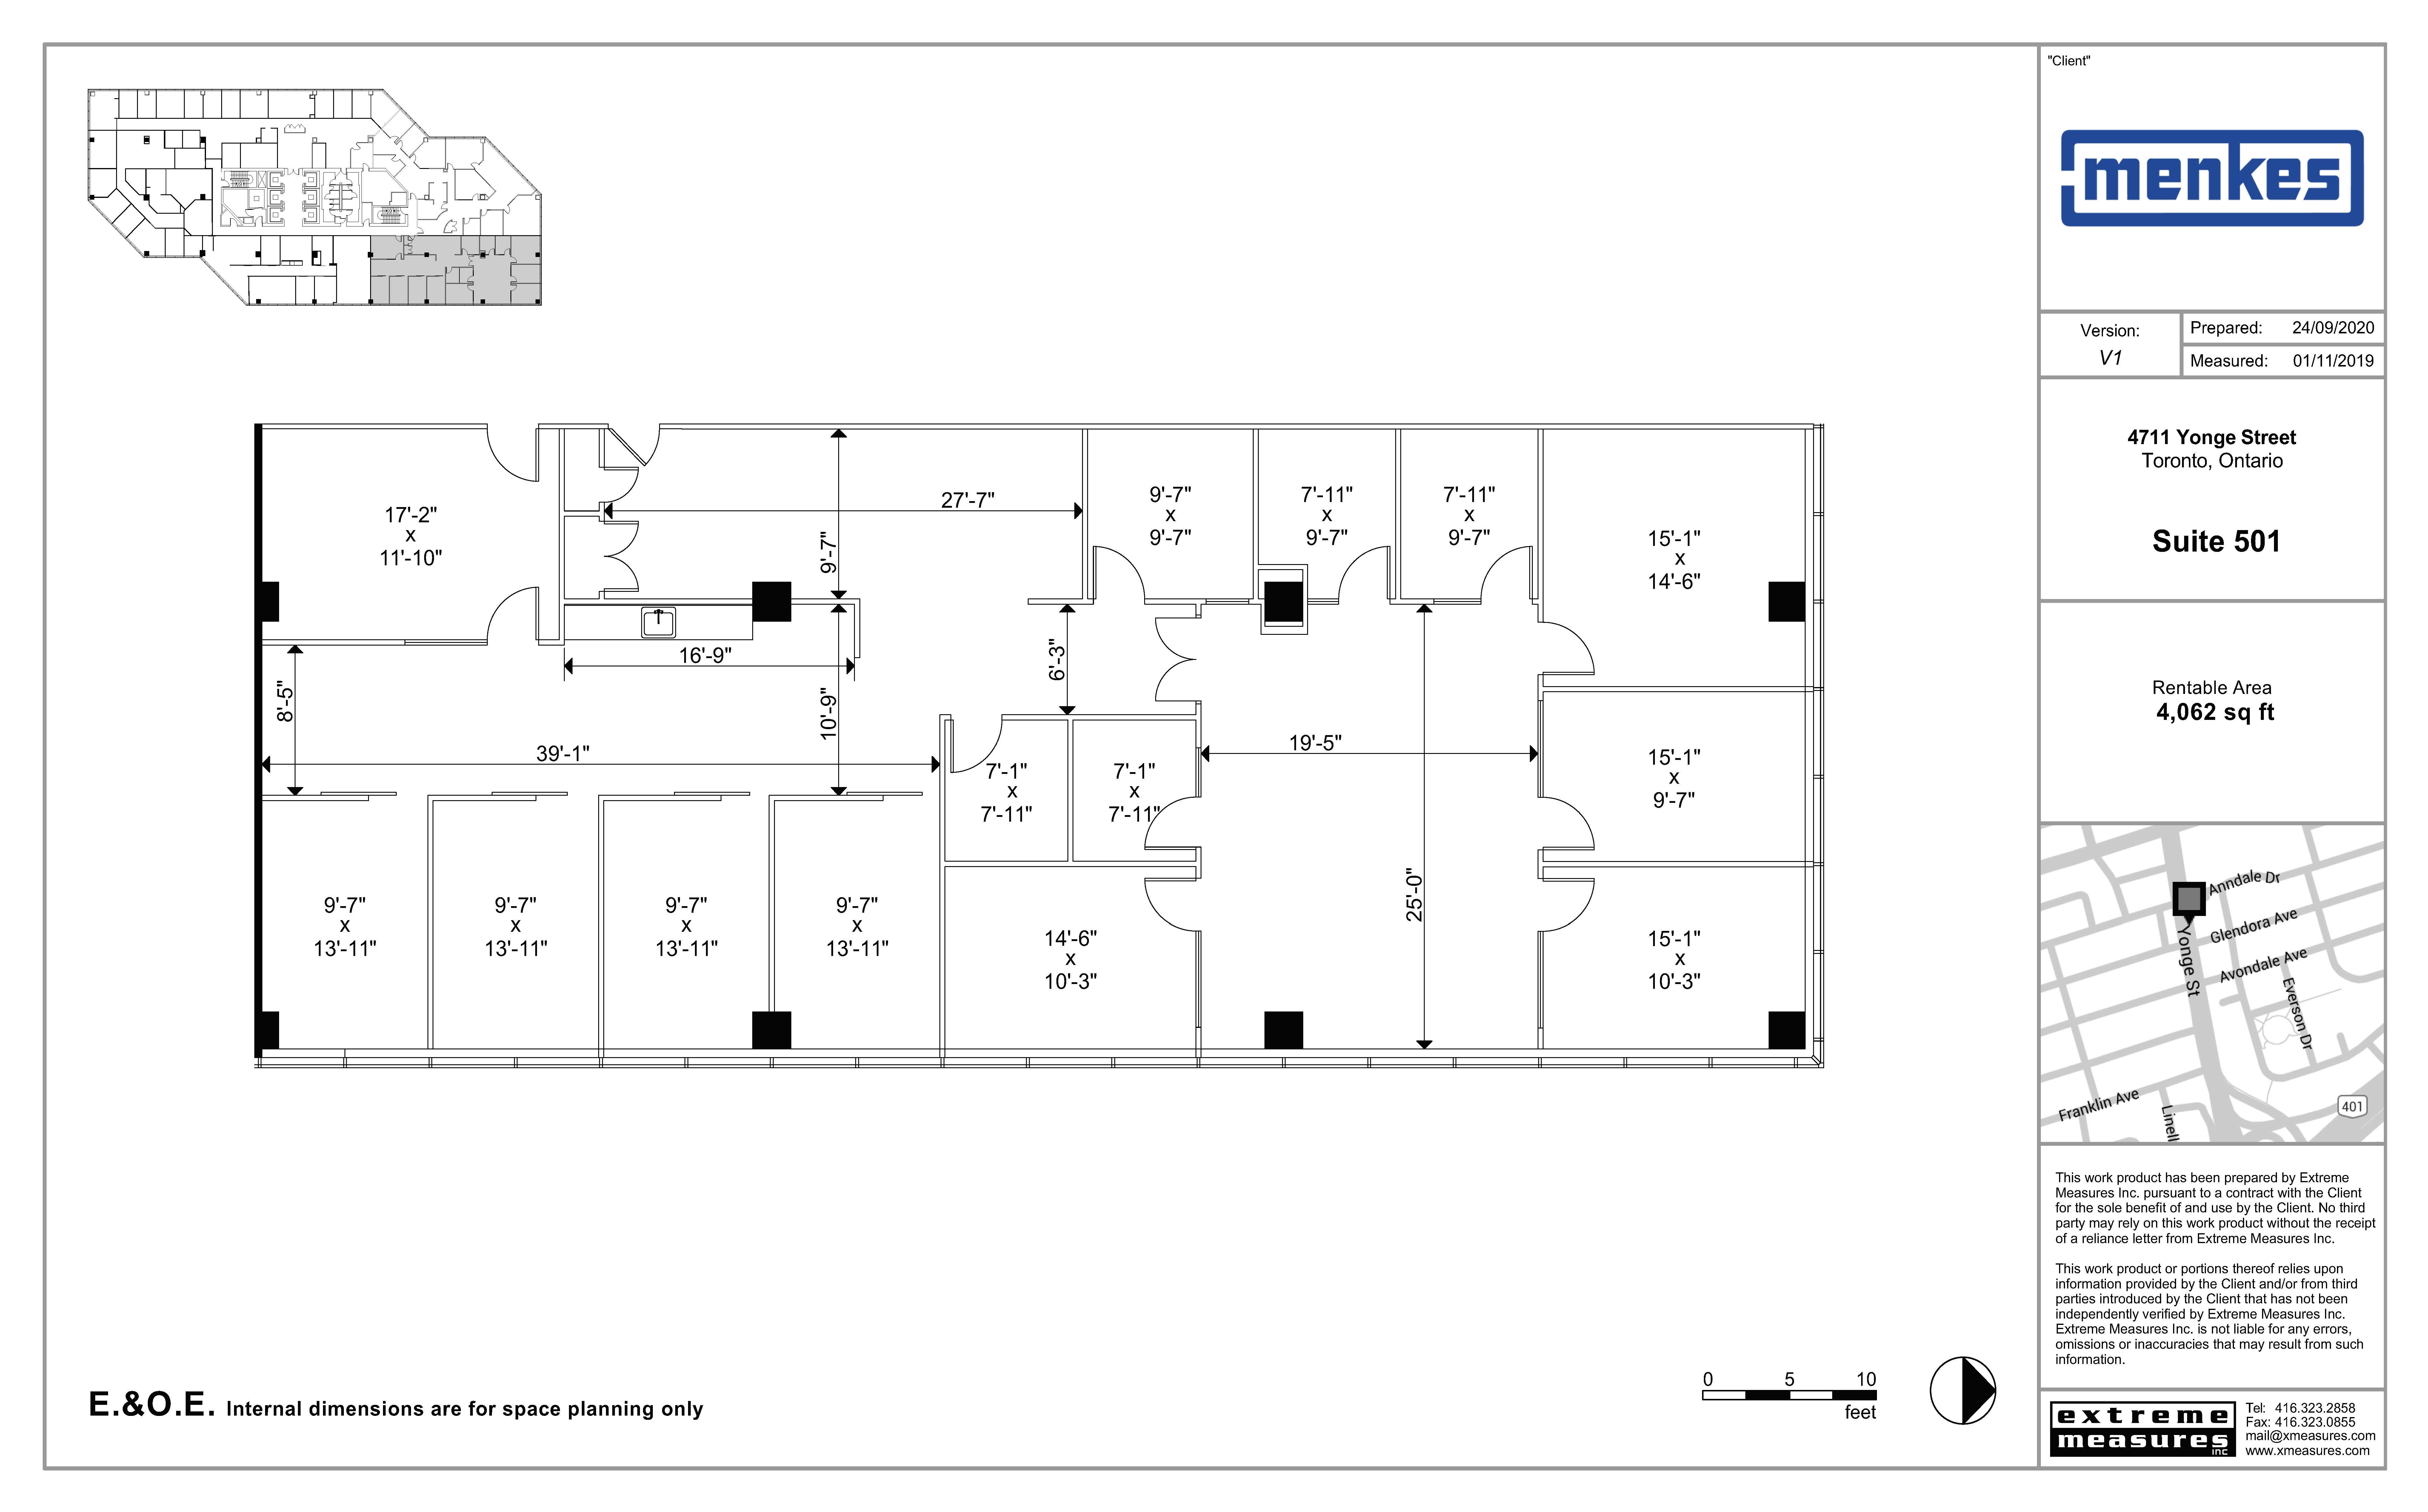 Floorplan thumbnail of Suite 501